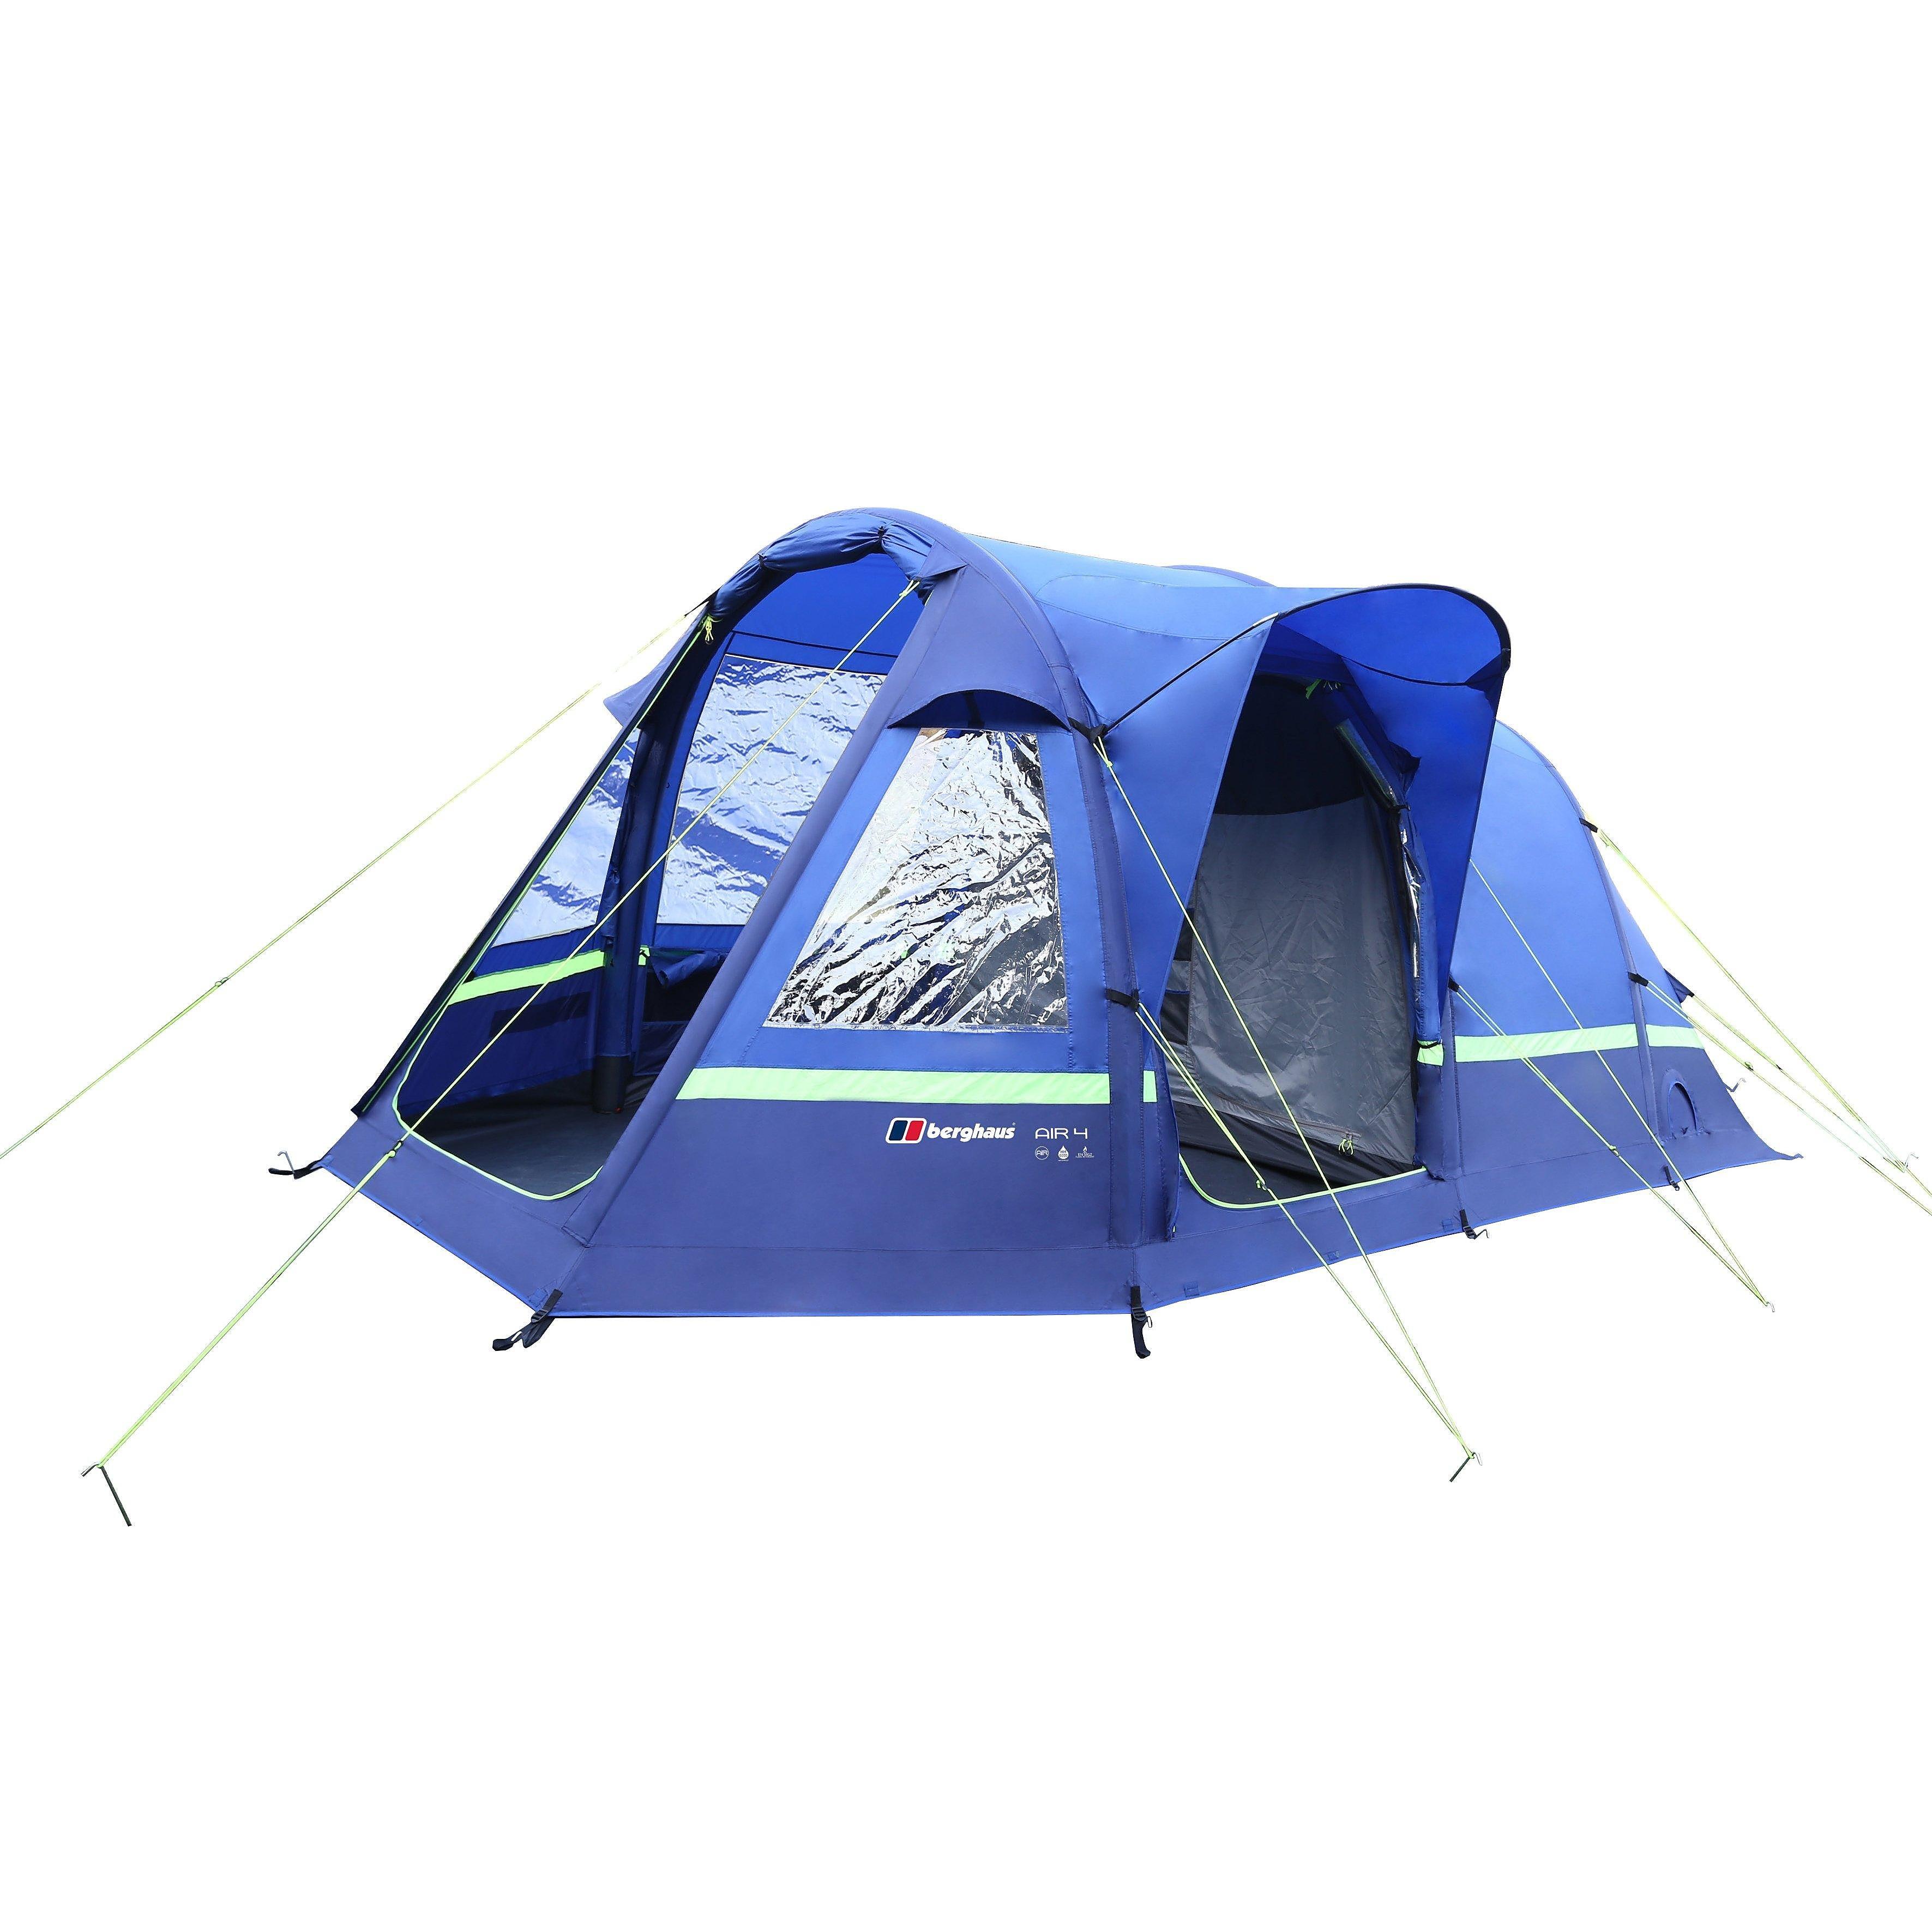 Berghaus Air 4 Tent - MBL/MBL, MBL/MBL